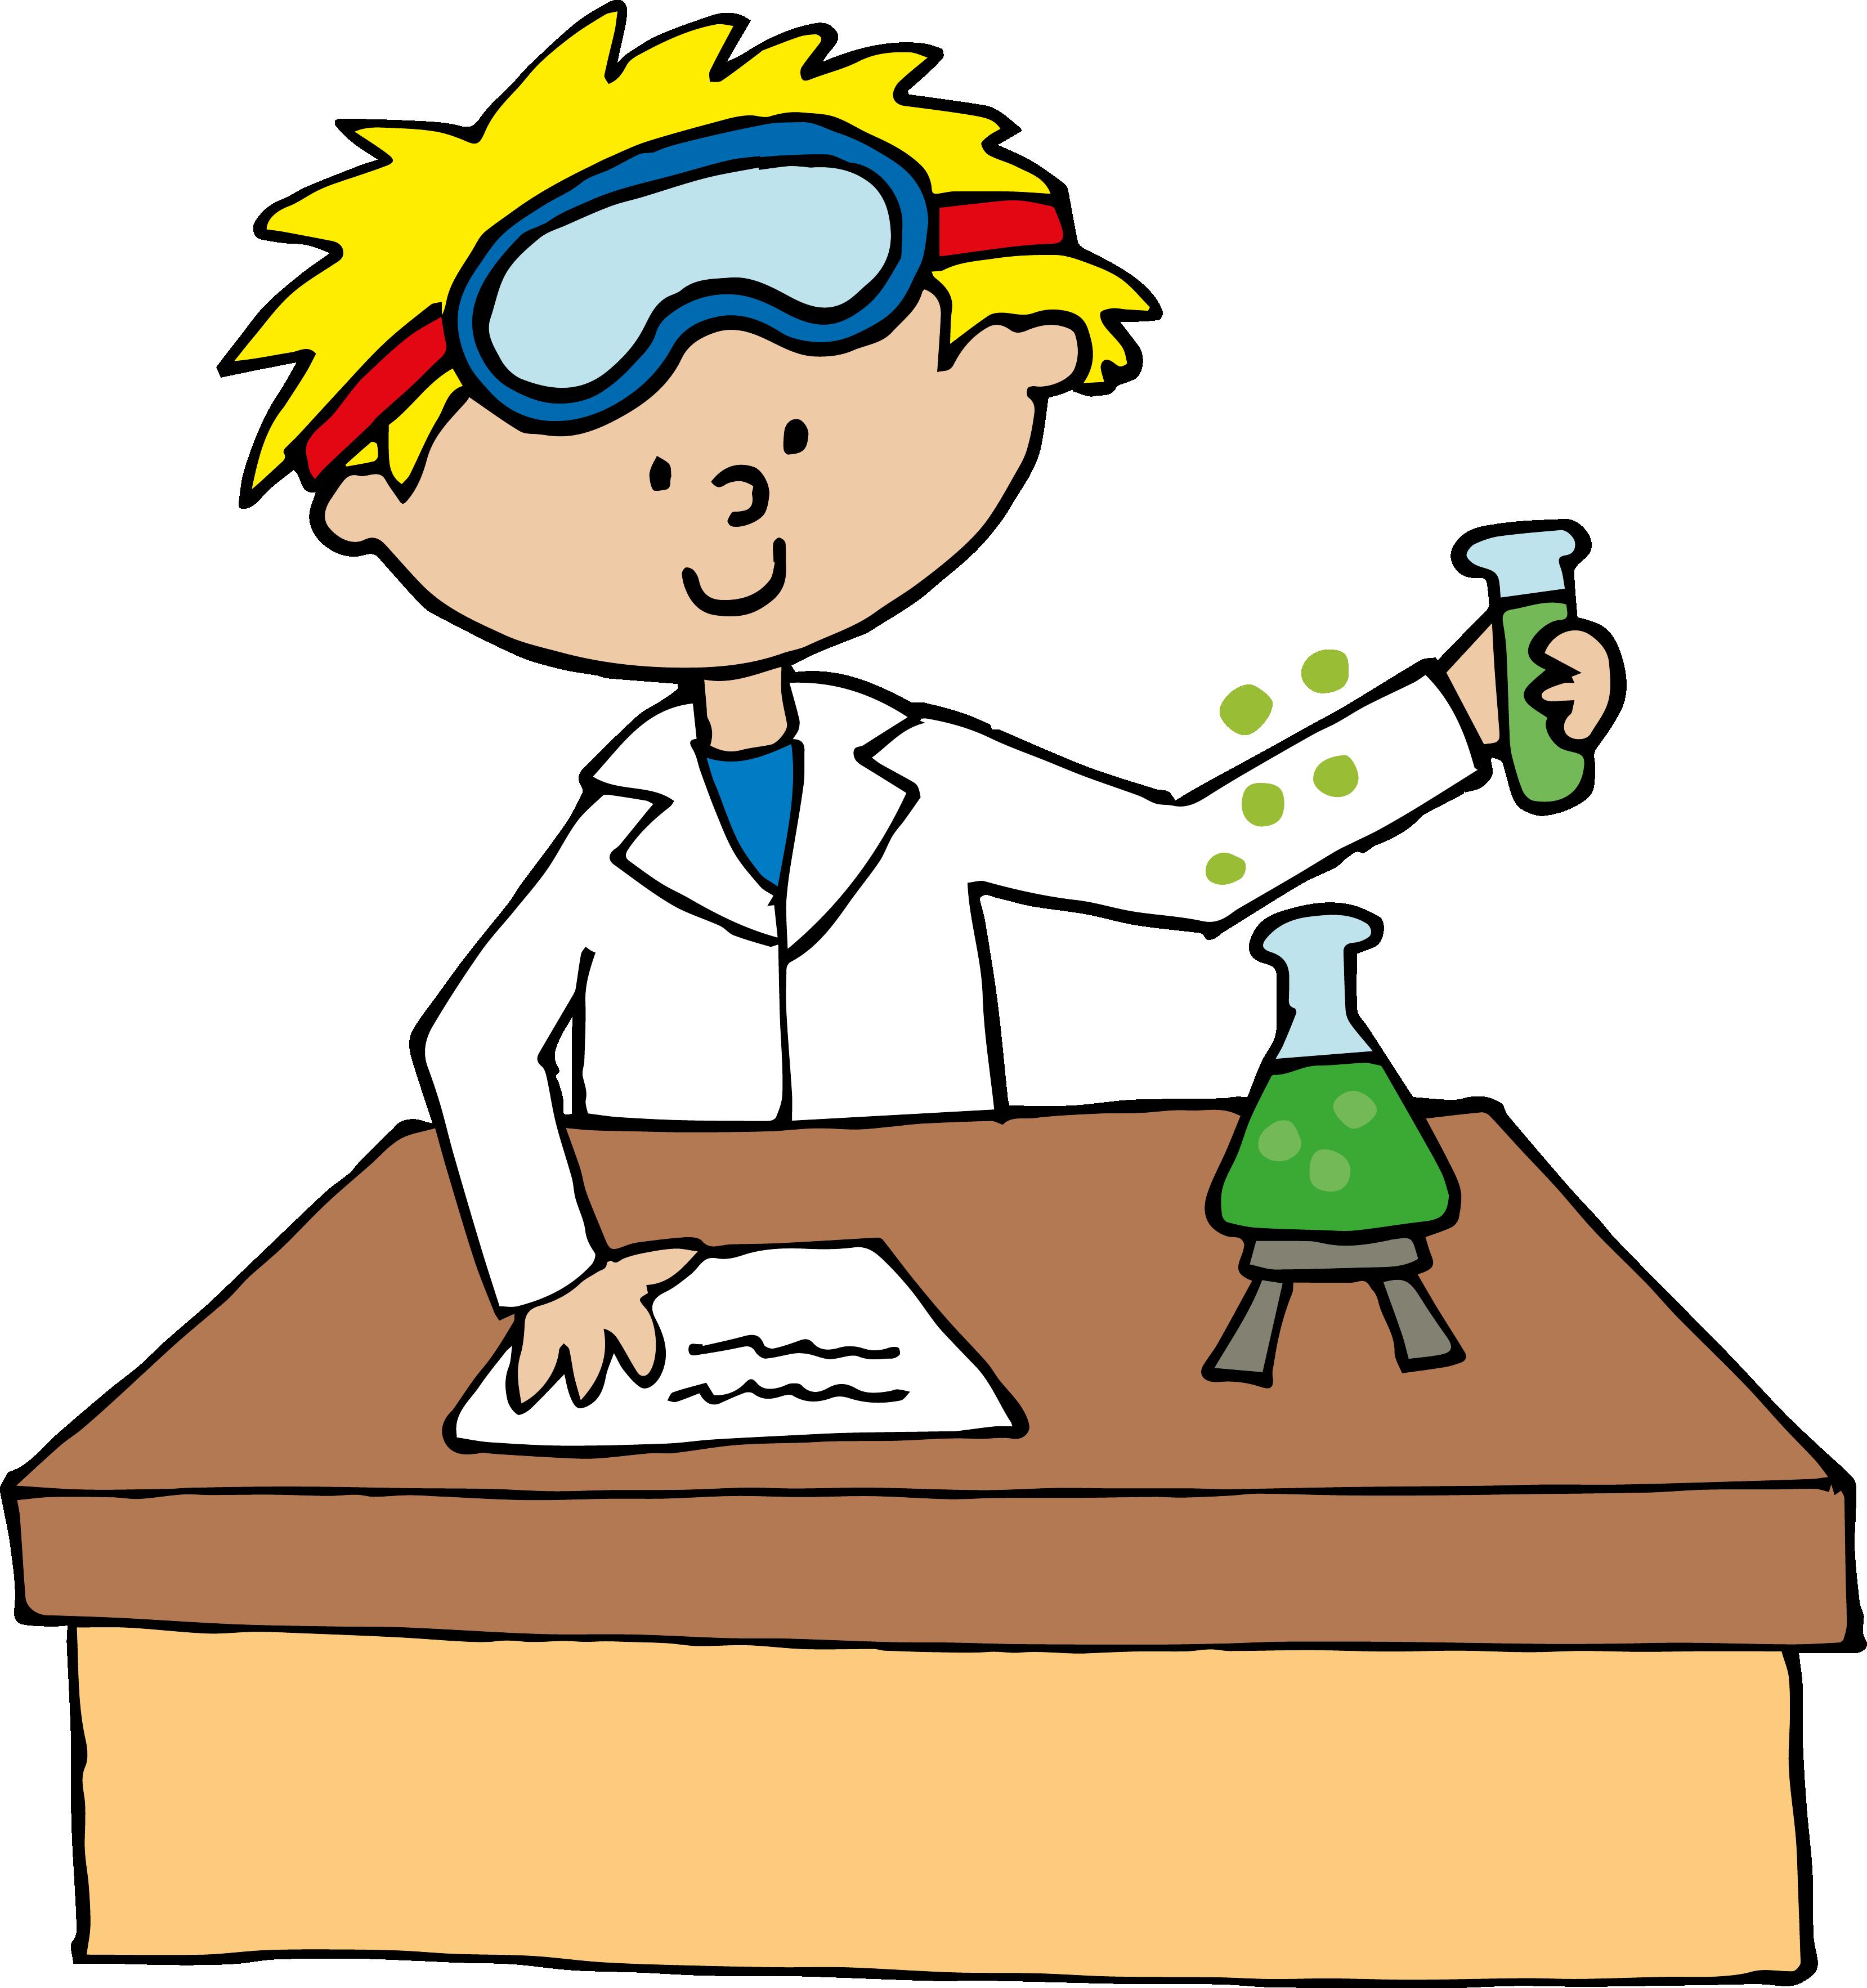 Scientist Clipart - ClipArt Best